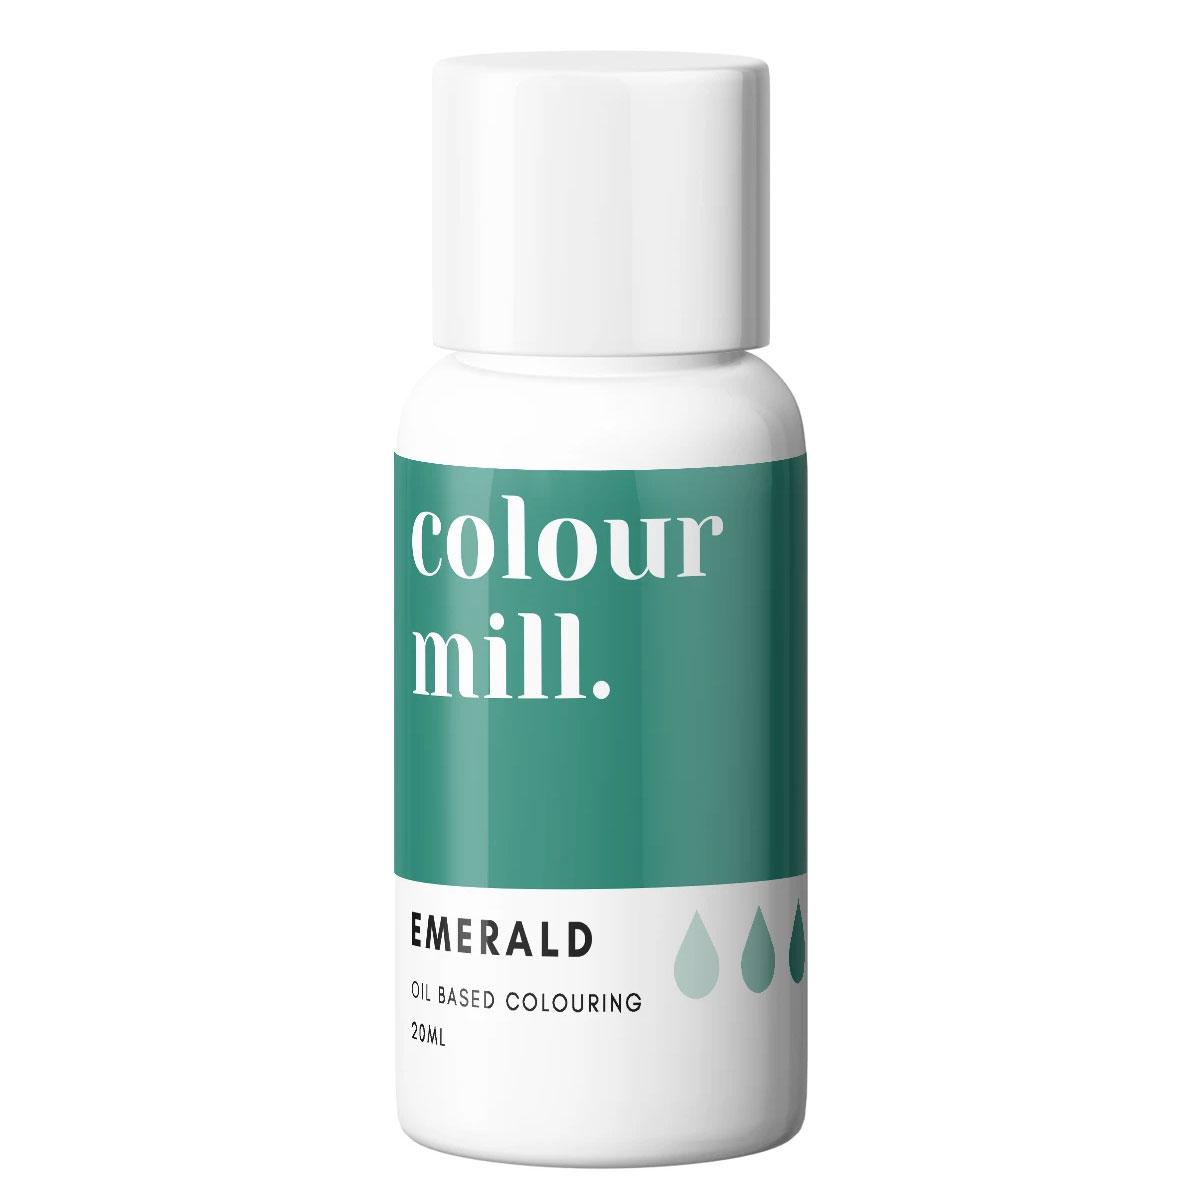 Colour Mill fettlösliche Lebensmittelfarbe - Emerald 20ml